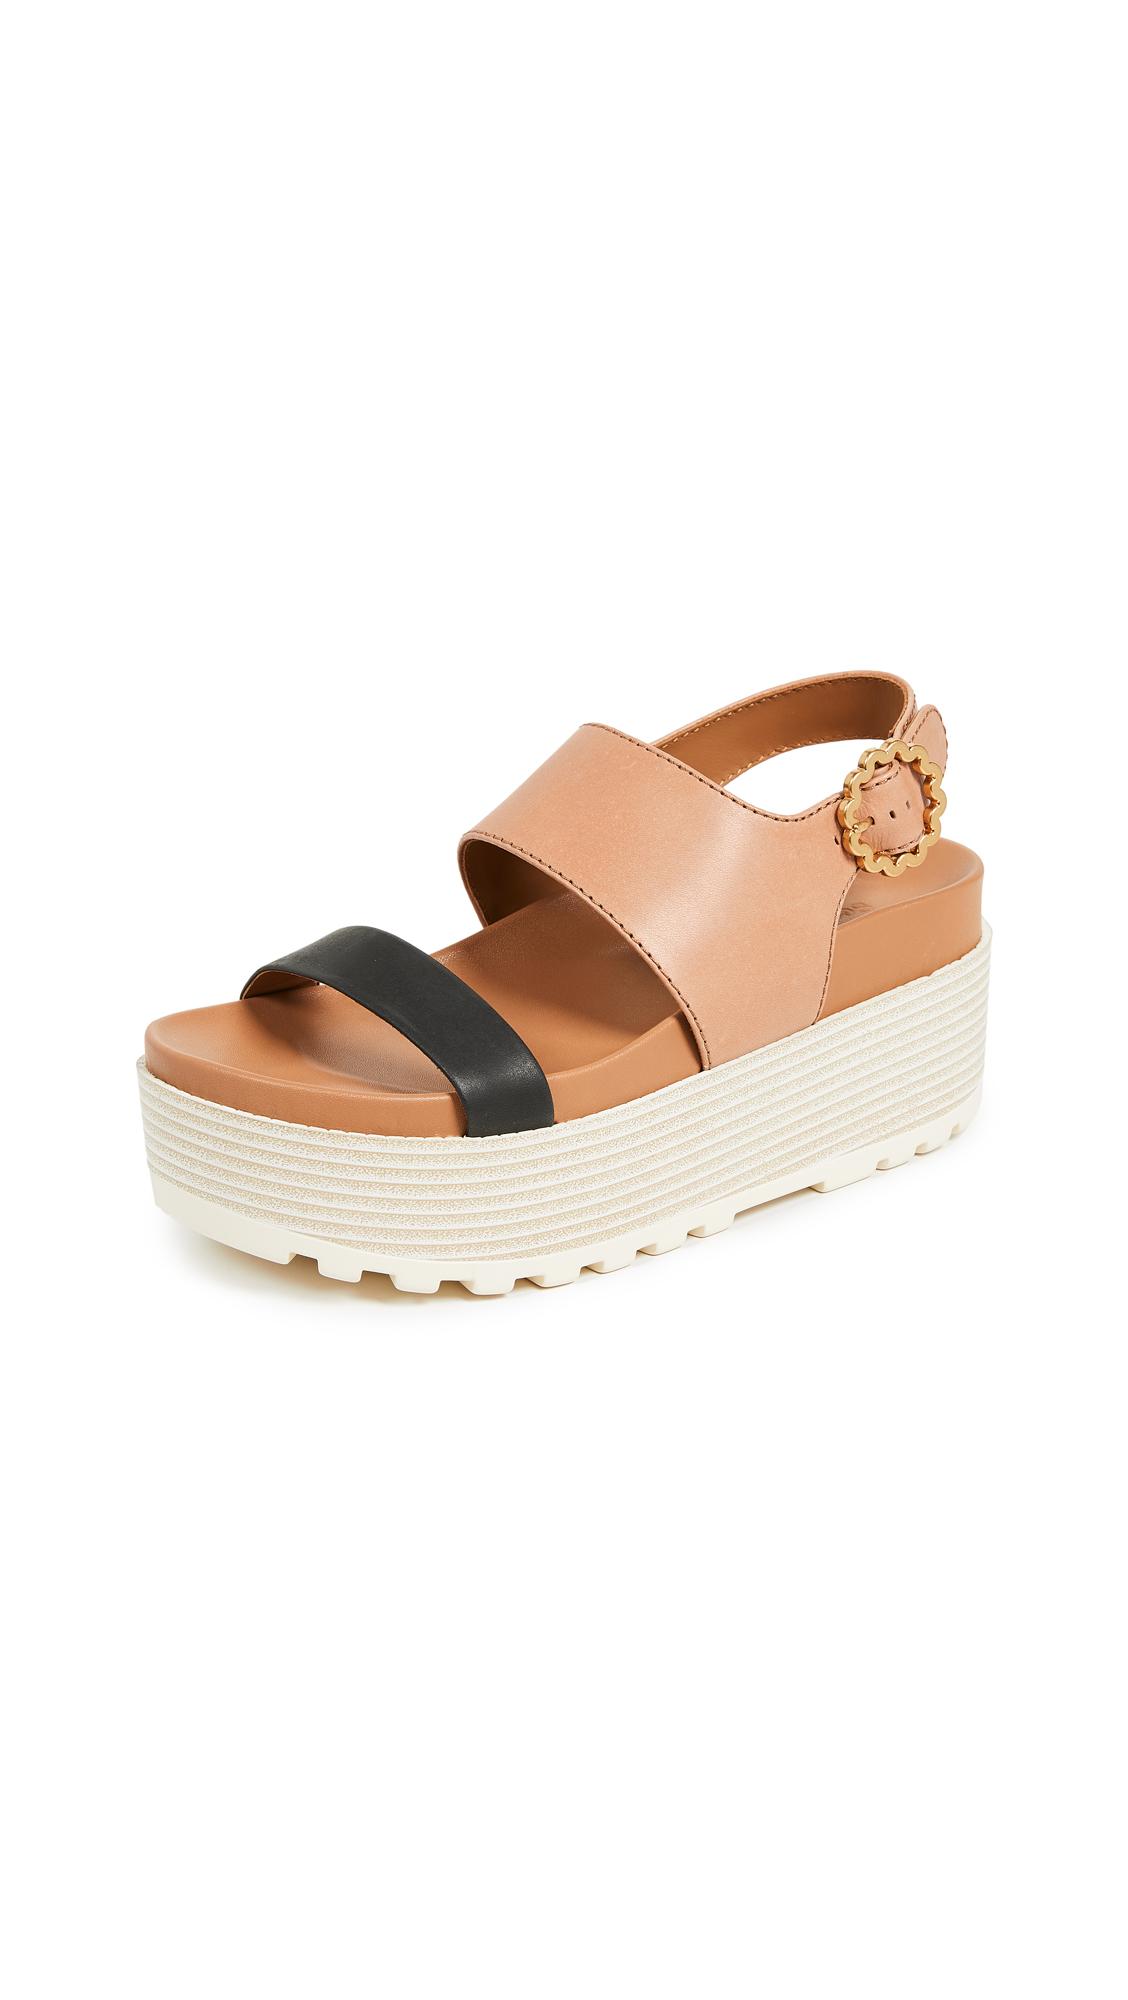 See by Chloe Jenna Platform Sandals - Natural/Nero